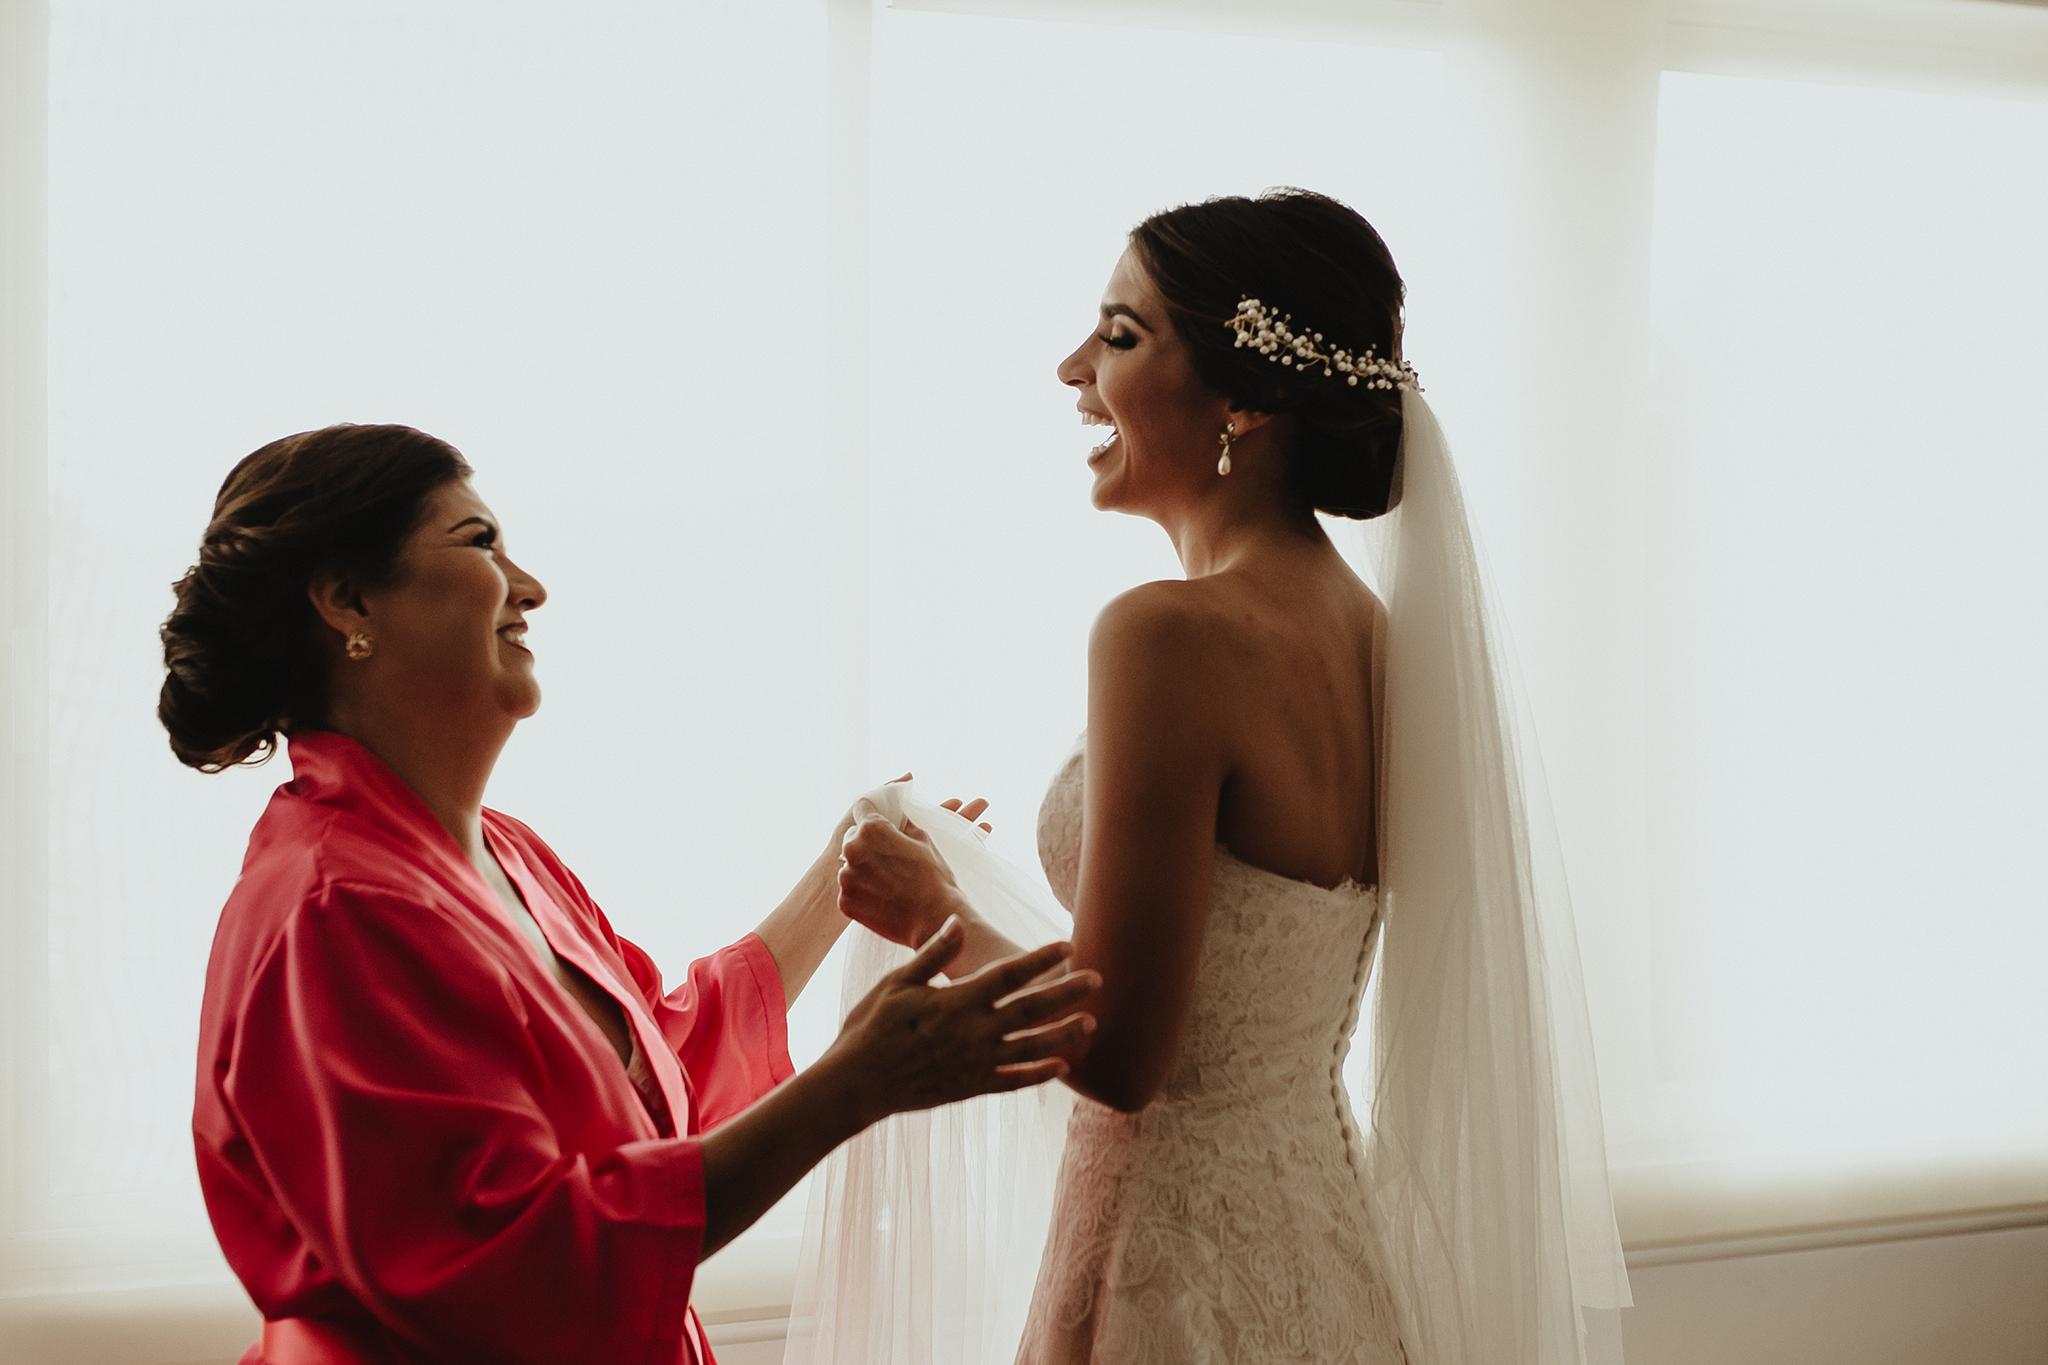 0093F&Yslide_WeddingDstination_MeridaYucatan_HaciendasMerida_BodasMexico_BodasYucatan_Boda_Destino.jpg